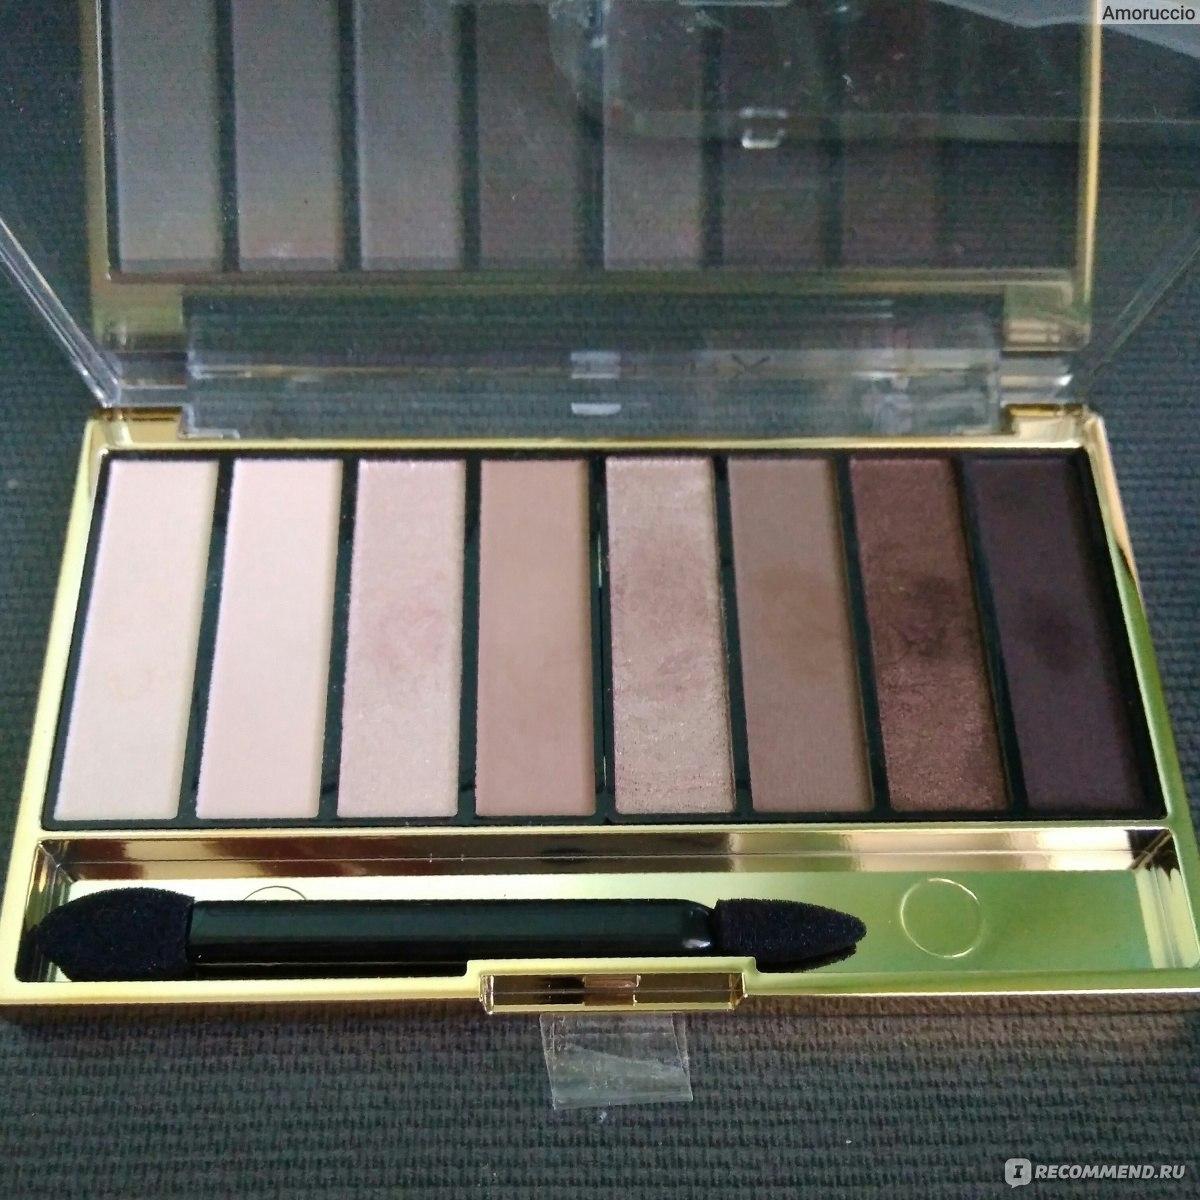 Палитра теней Max Factor Masterpiece nude palette - «Тени